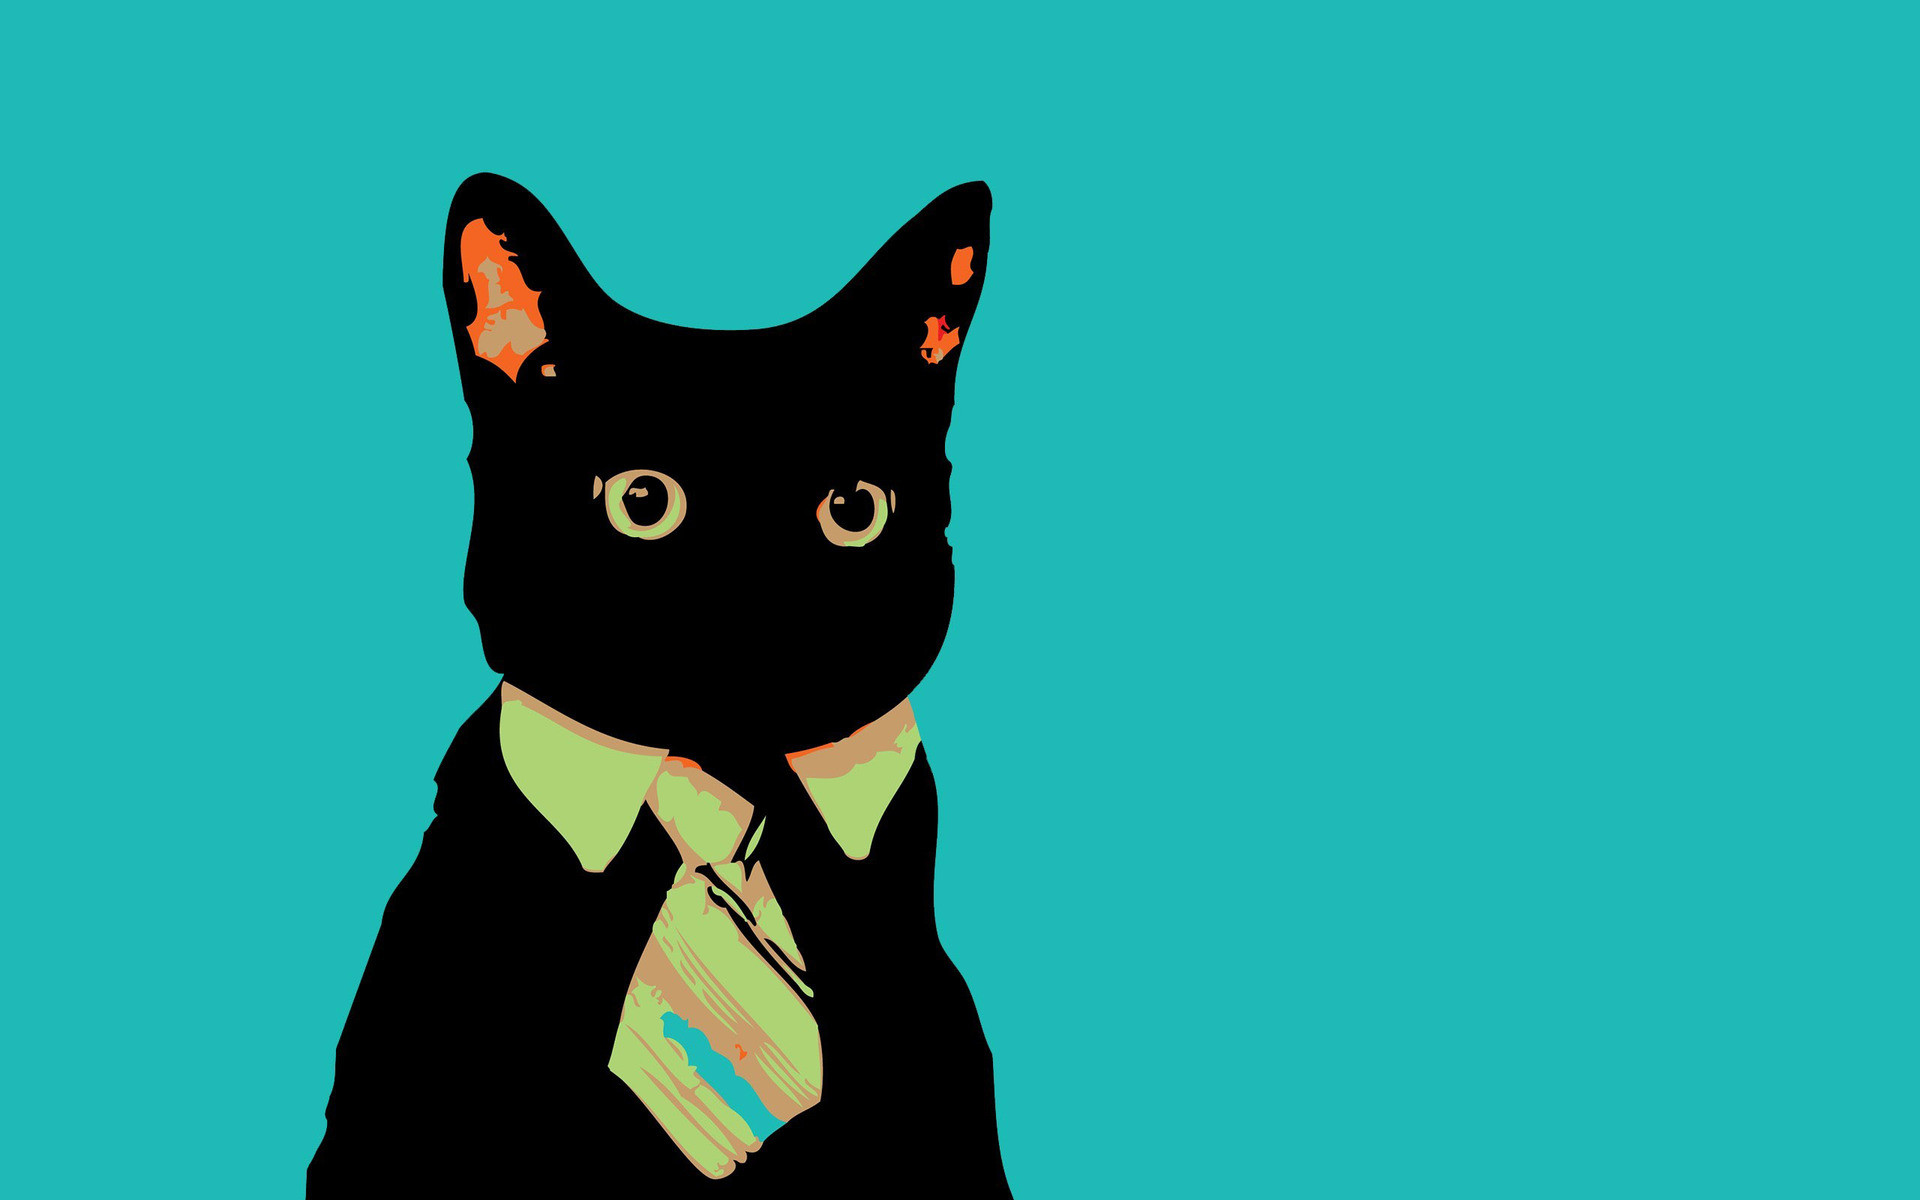 business-cat-meme-meme-hd-wallpaper-1920×1200-6867.